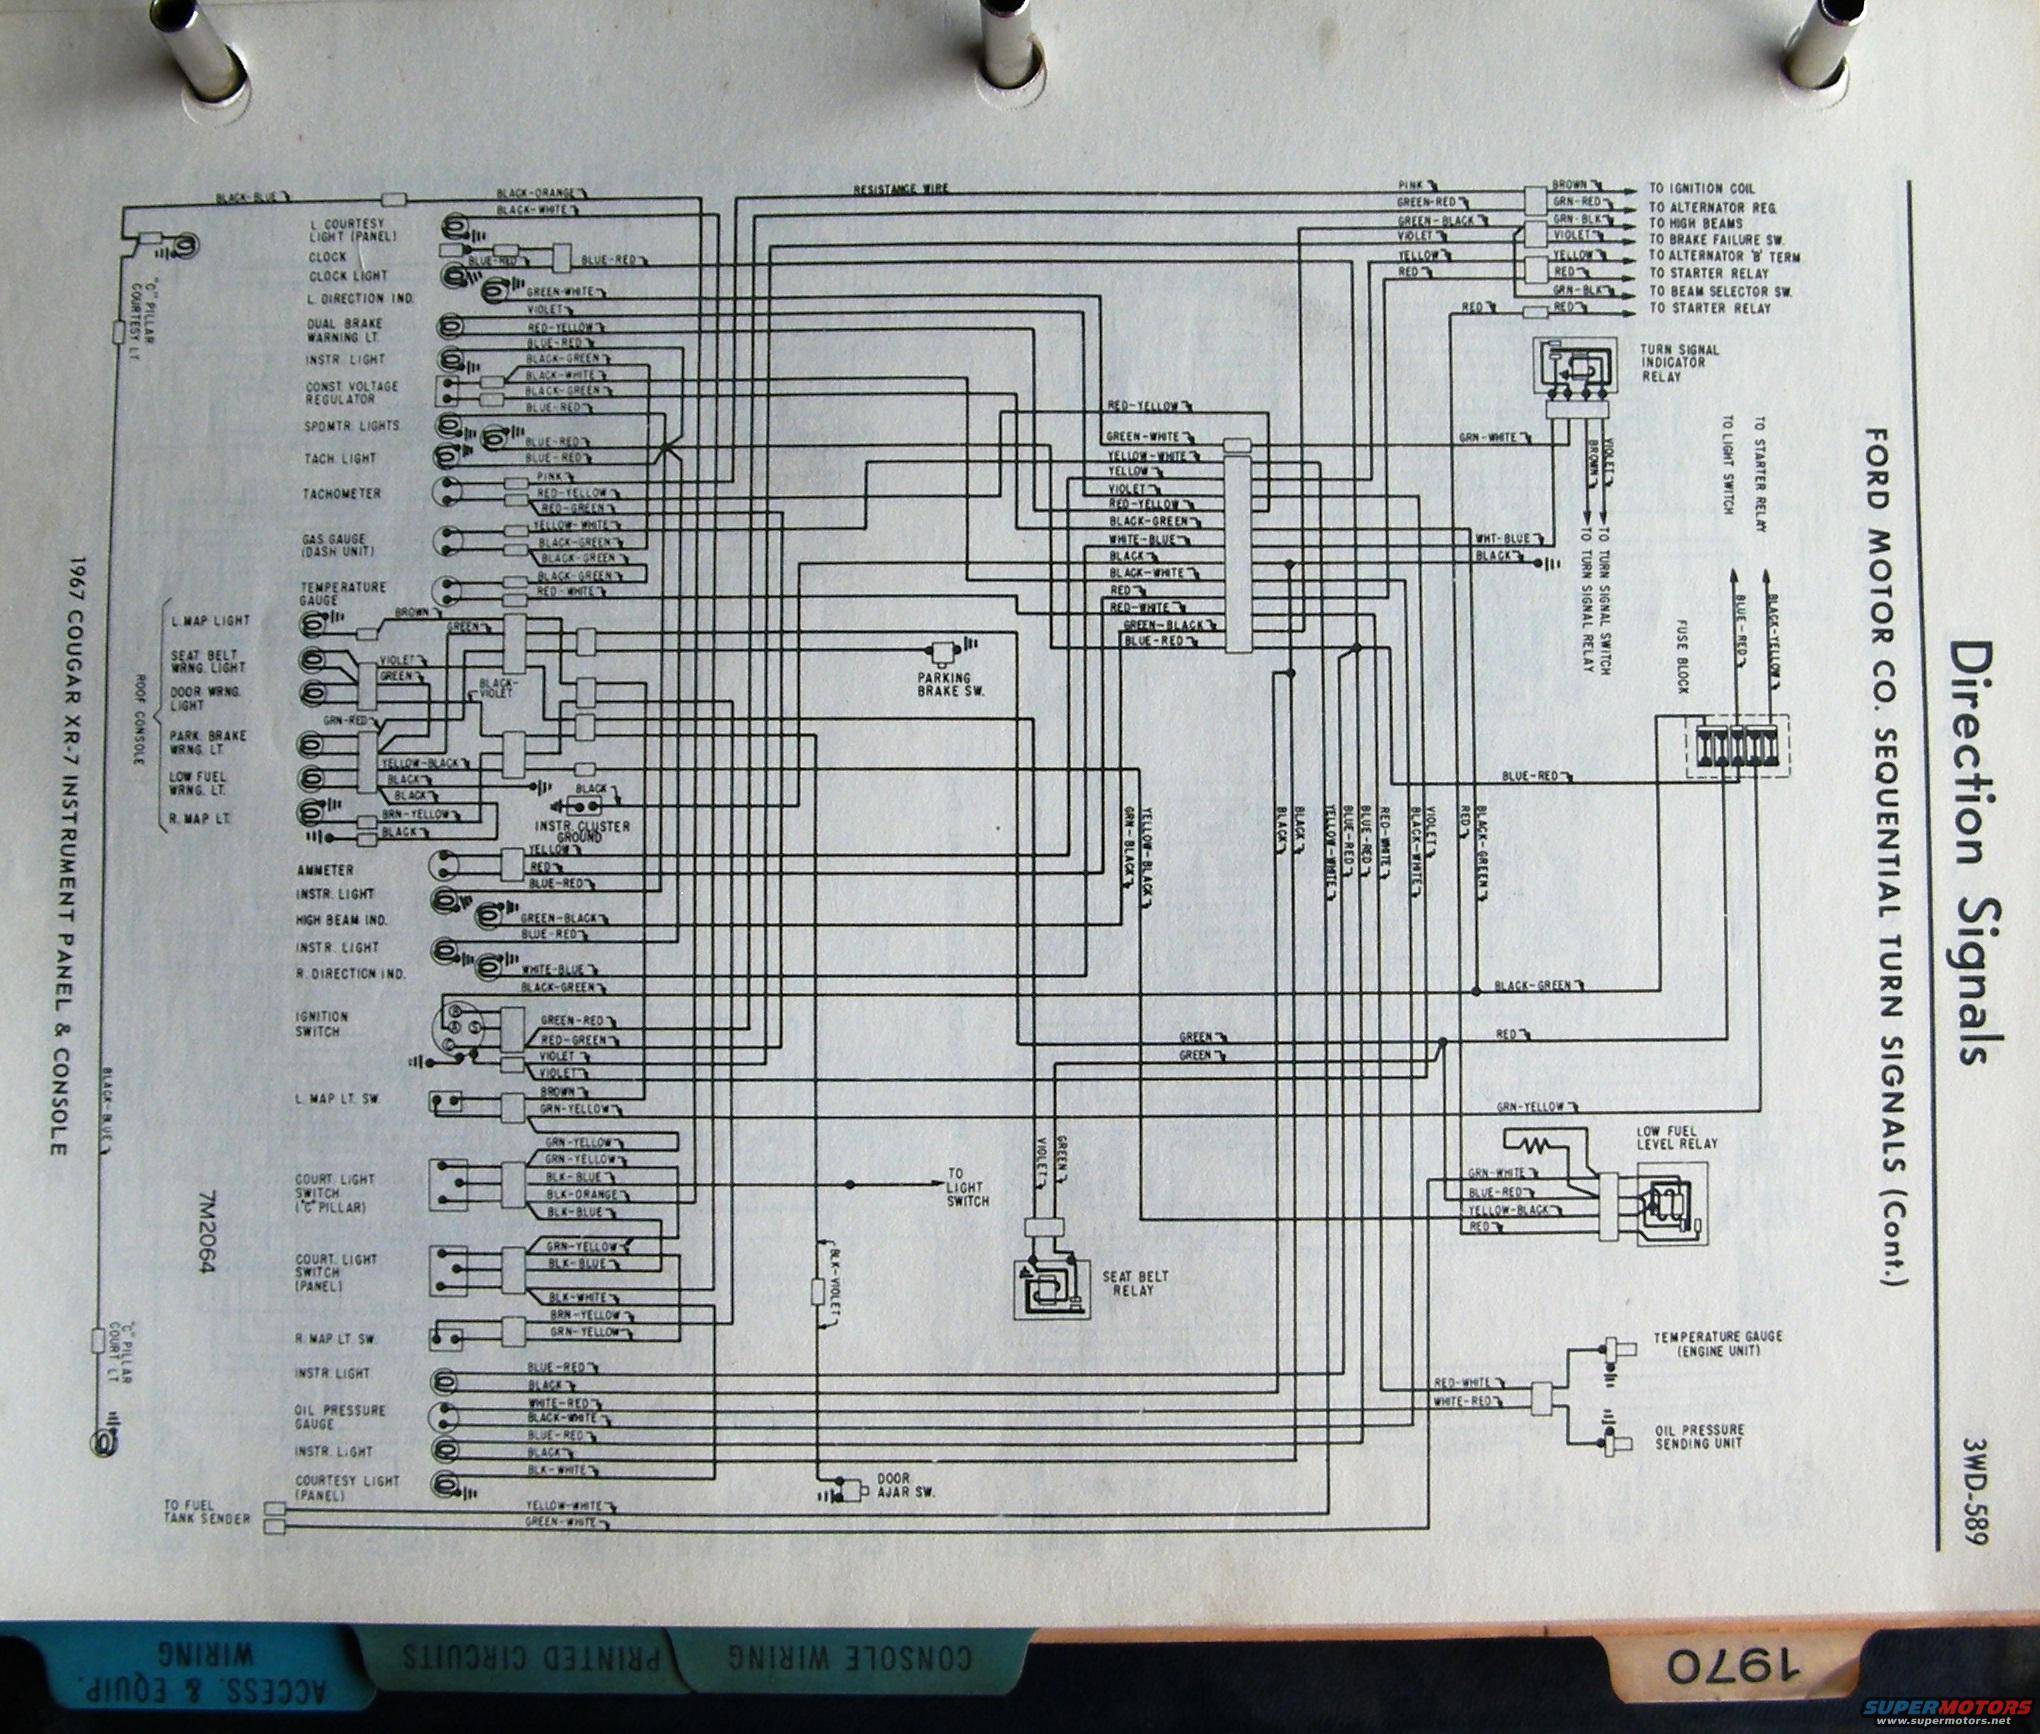 1968 cougar wiring harness diagram wiring diagram 1968 mercury cougar electrical factory